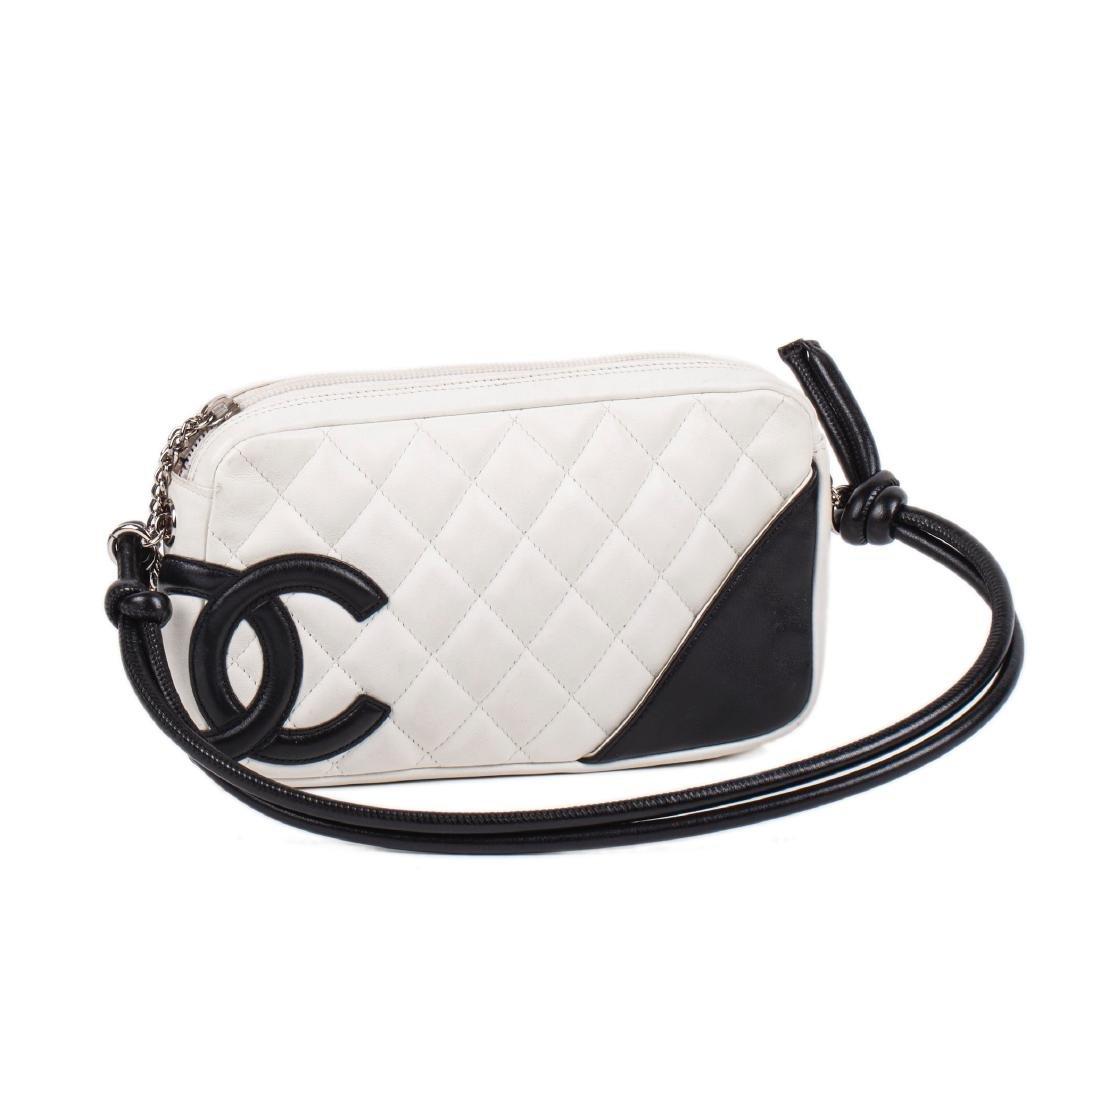 Chanel Cambon ligne lambskin leather bag